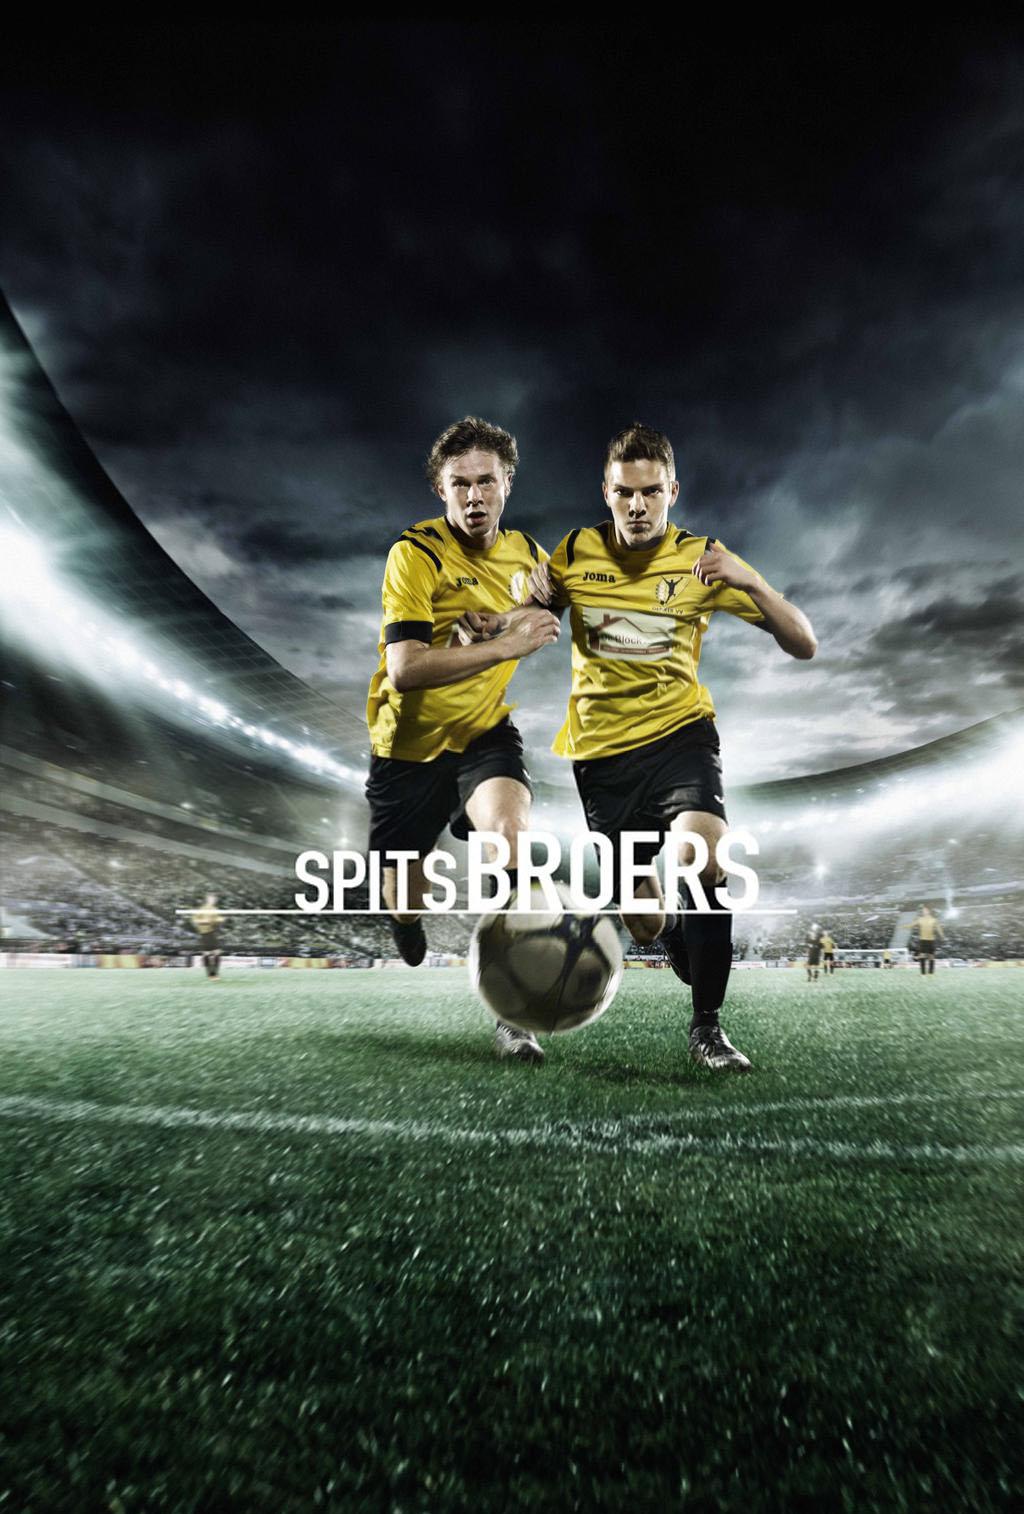 #SeriesMania 2015 - <i>Strikers</i> saison 1 / season 1 2 image